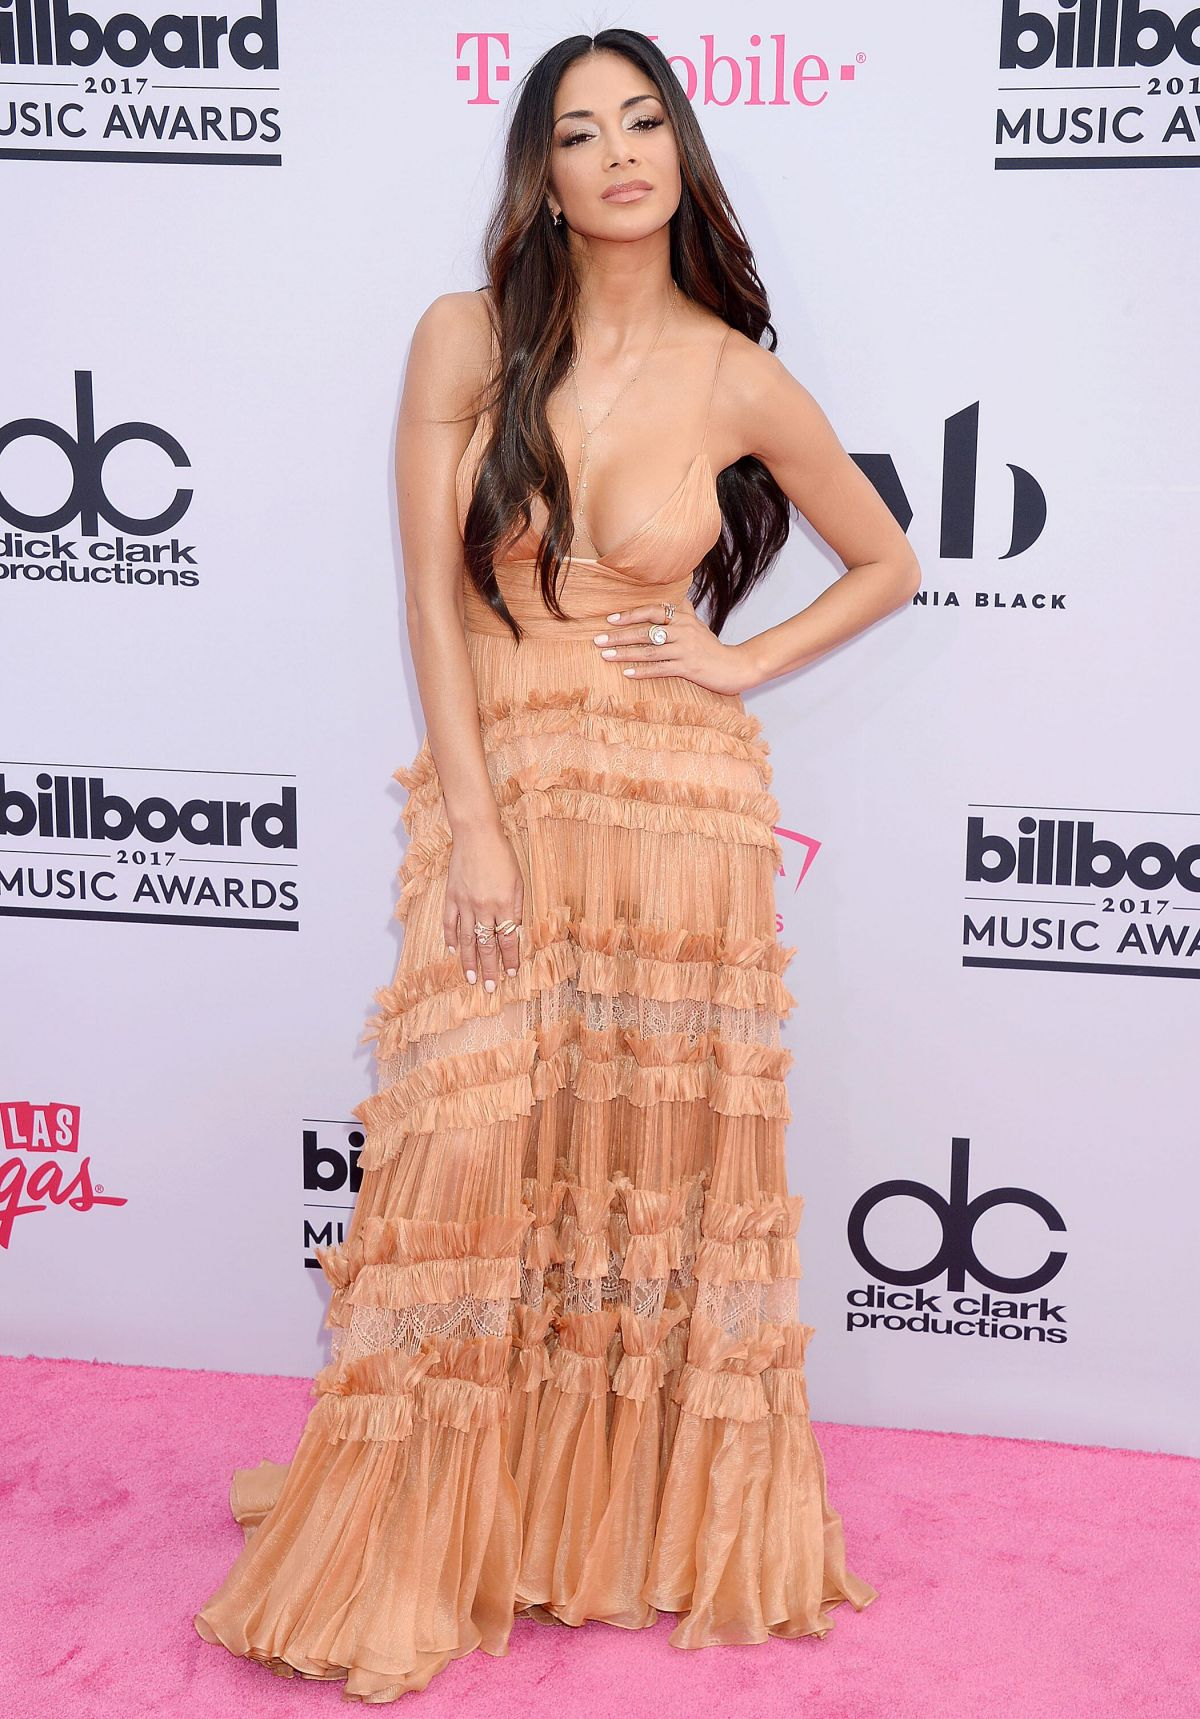 nicole-scherzinger-at-billboard-music-awards-2017-in-las-vegas-05-21-2017_3.jpg